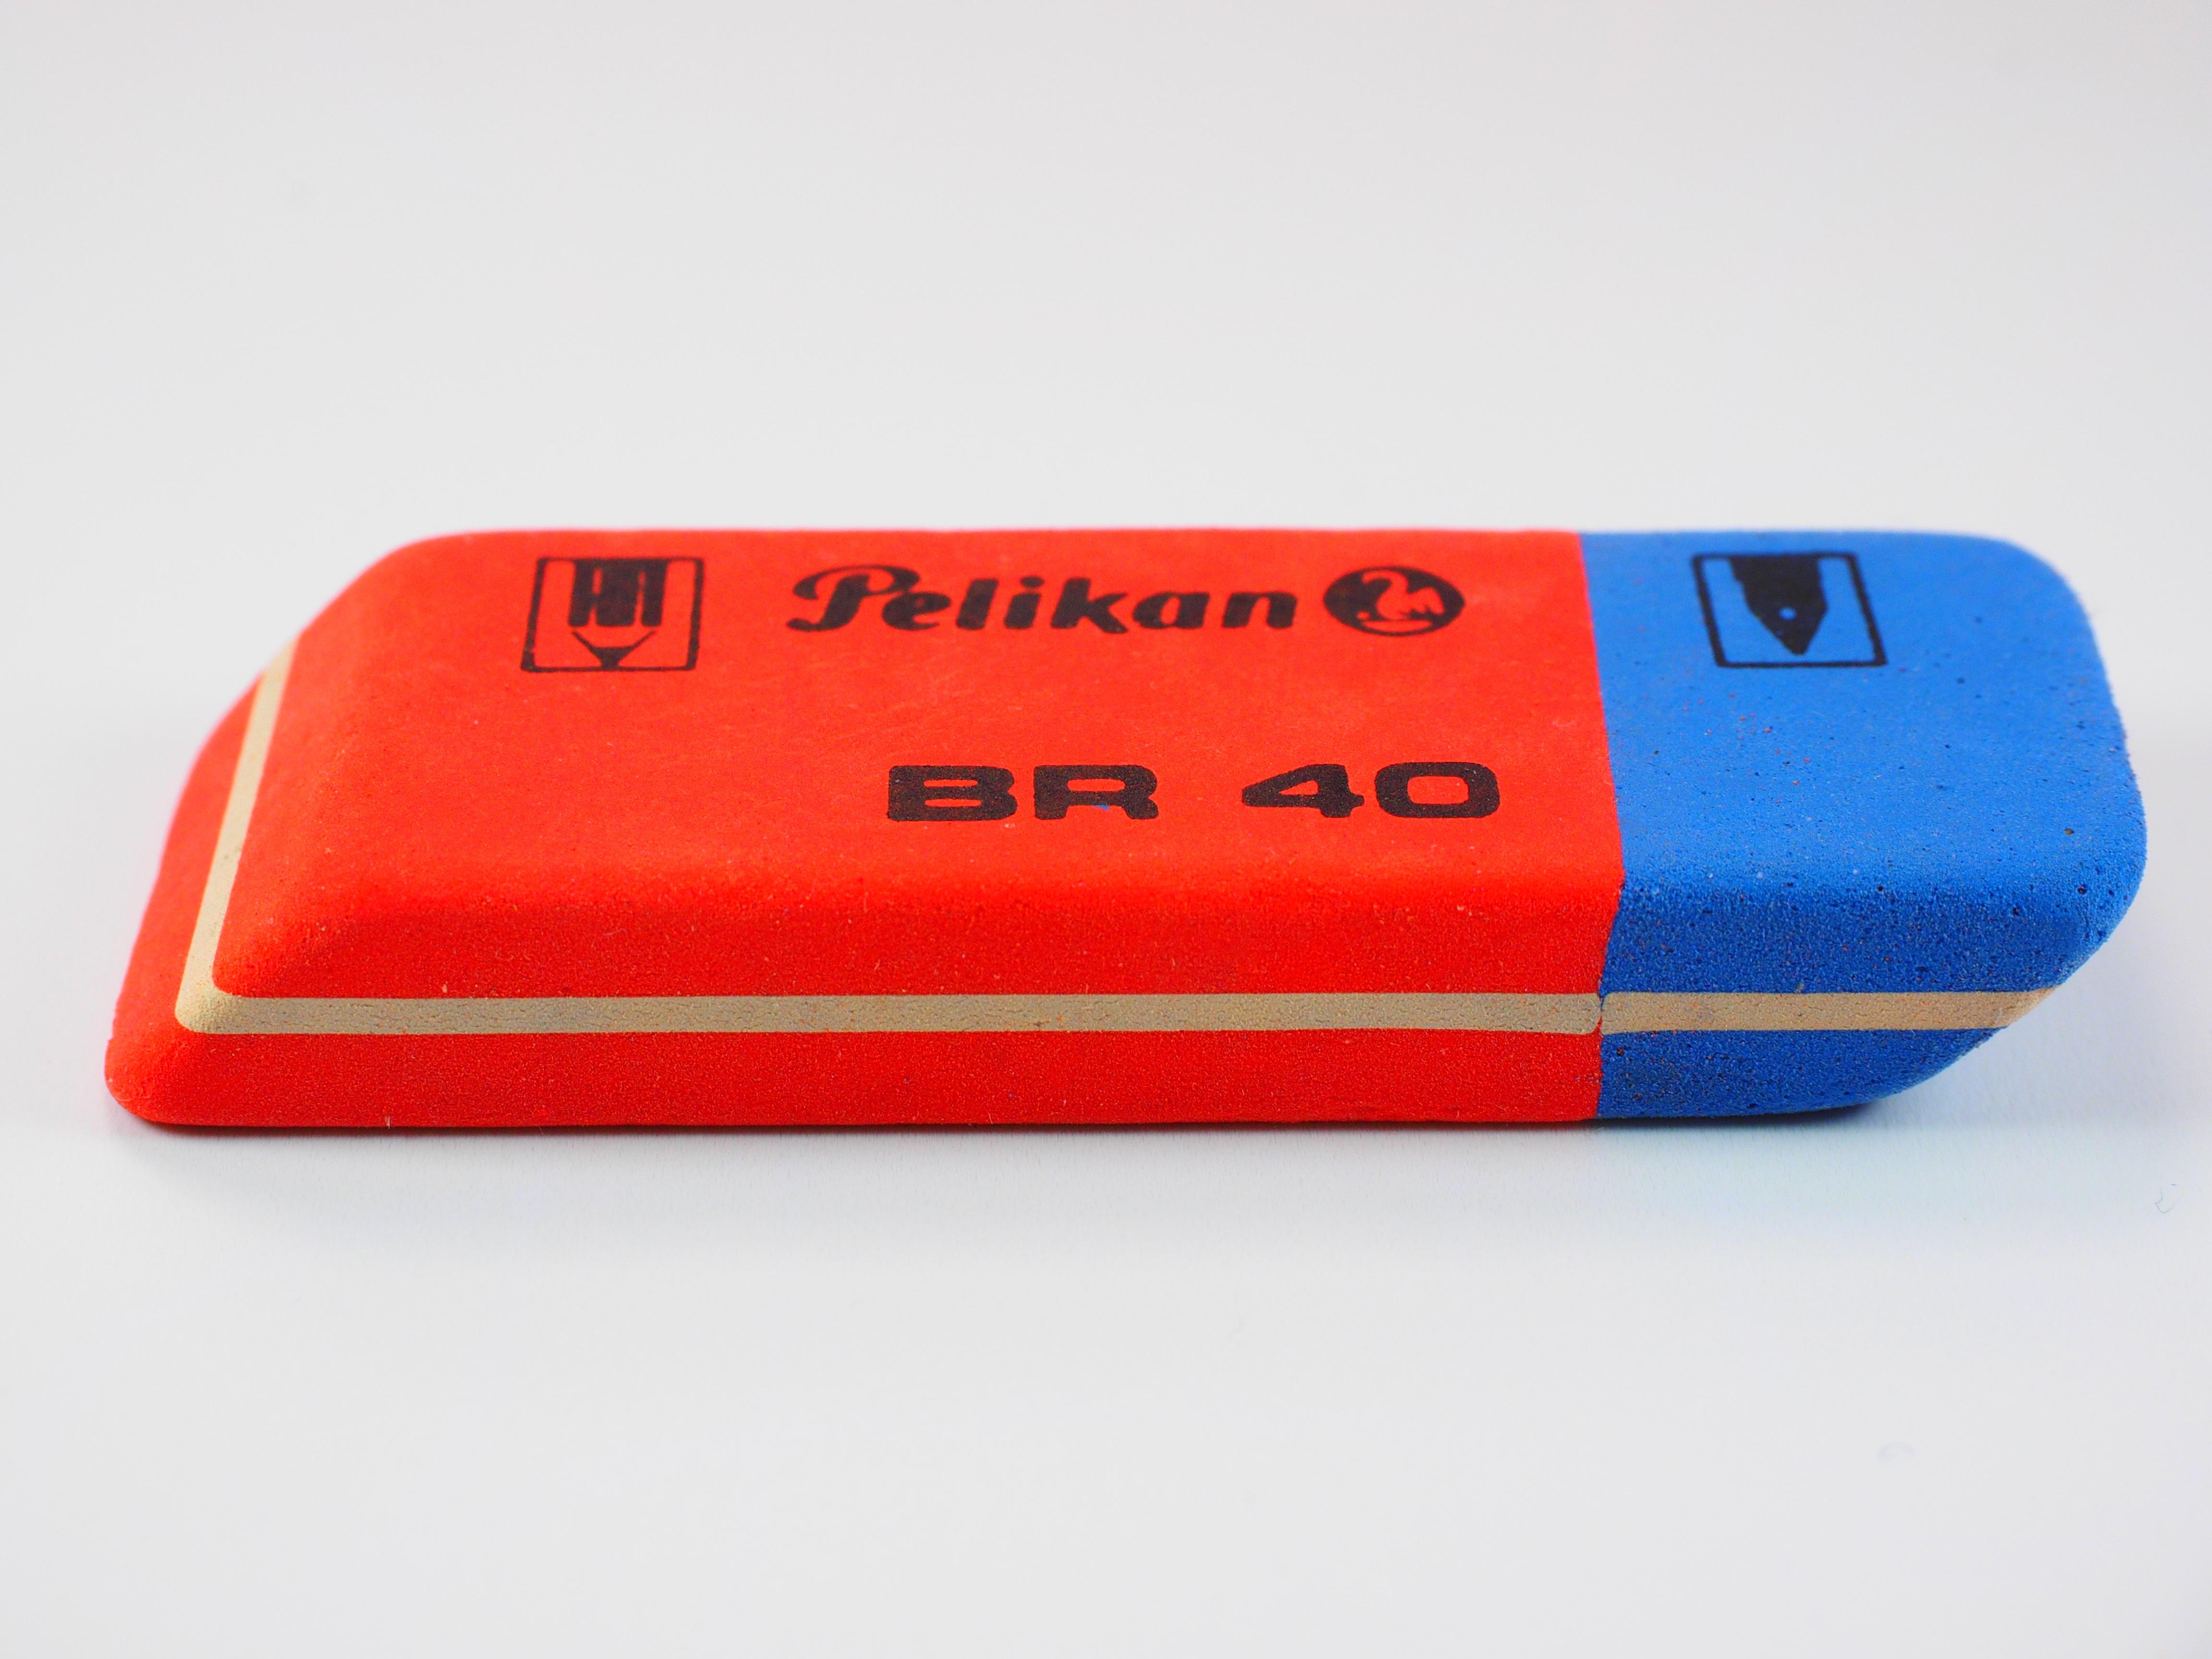 eraser-office-supplies-office-office-accessories.jpg